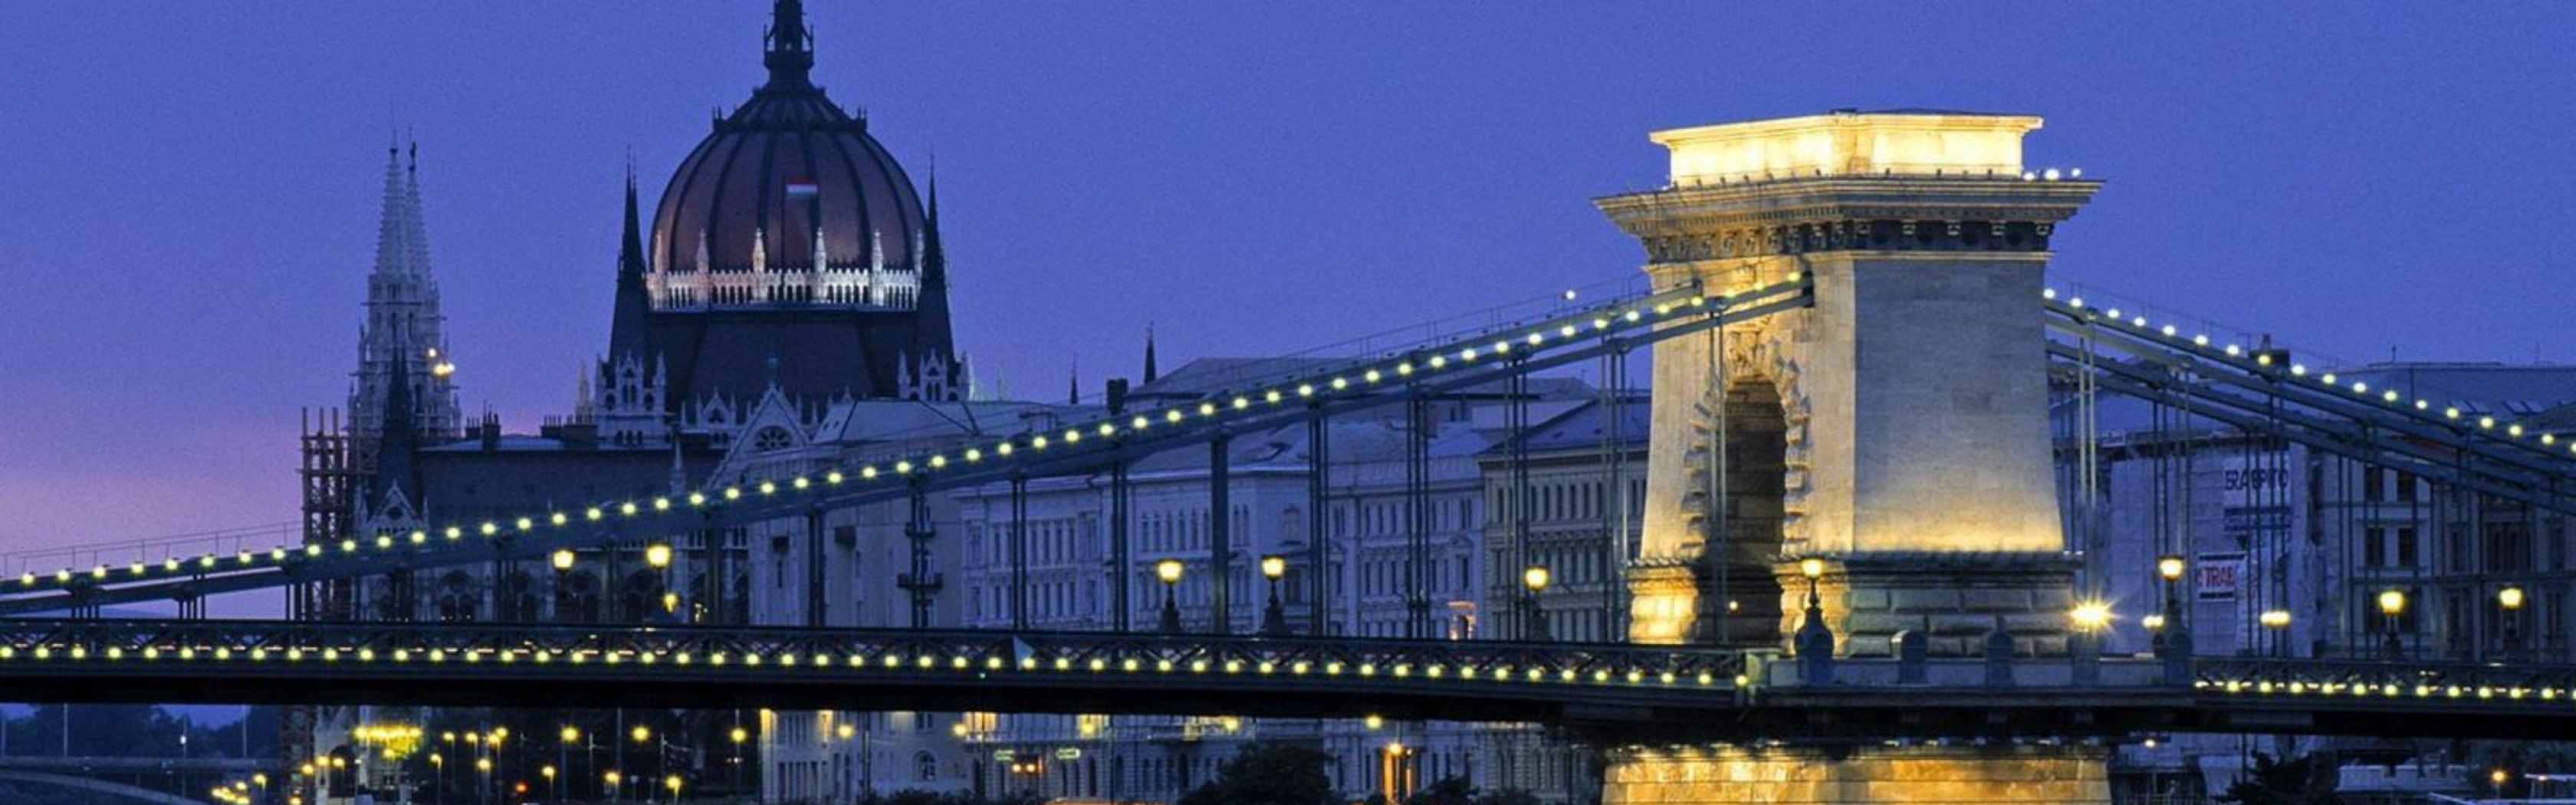 szechenyi-bridge-budapest-hungary-1050x3360